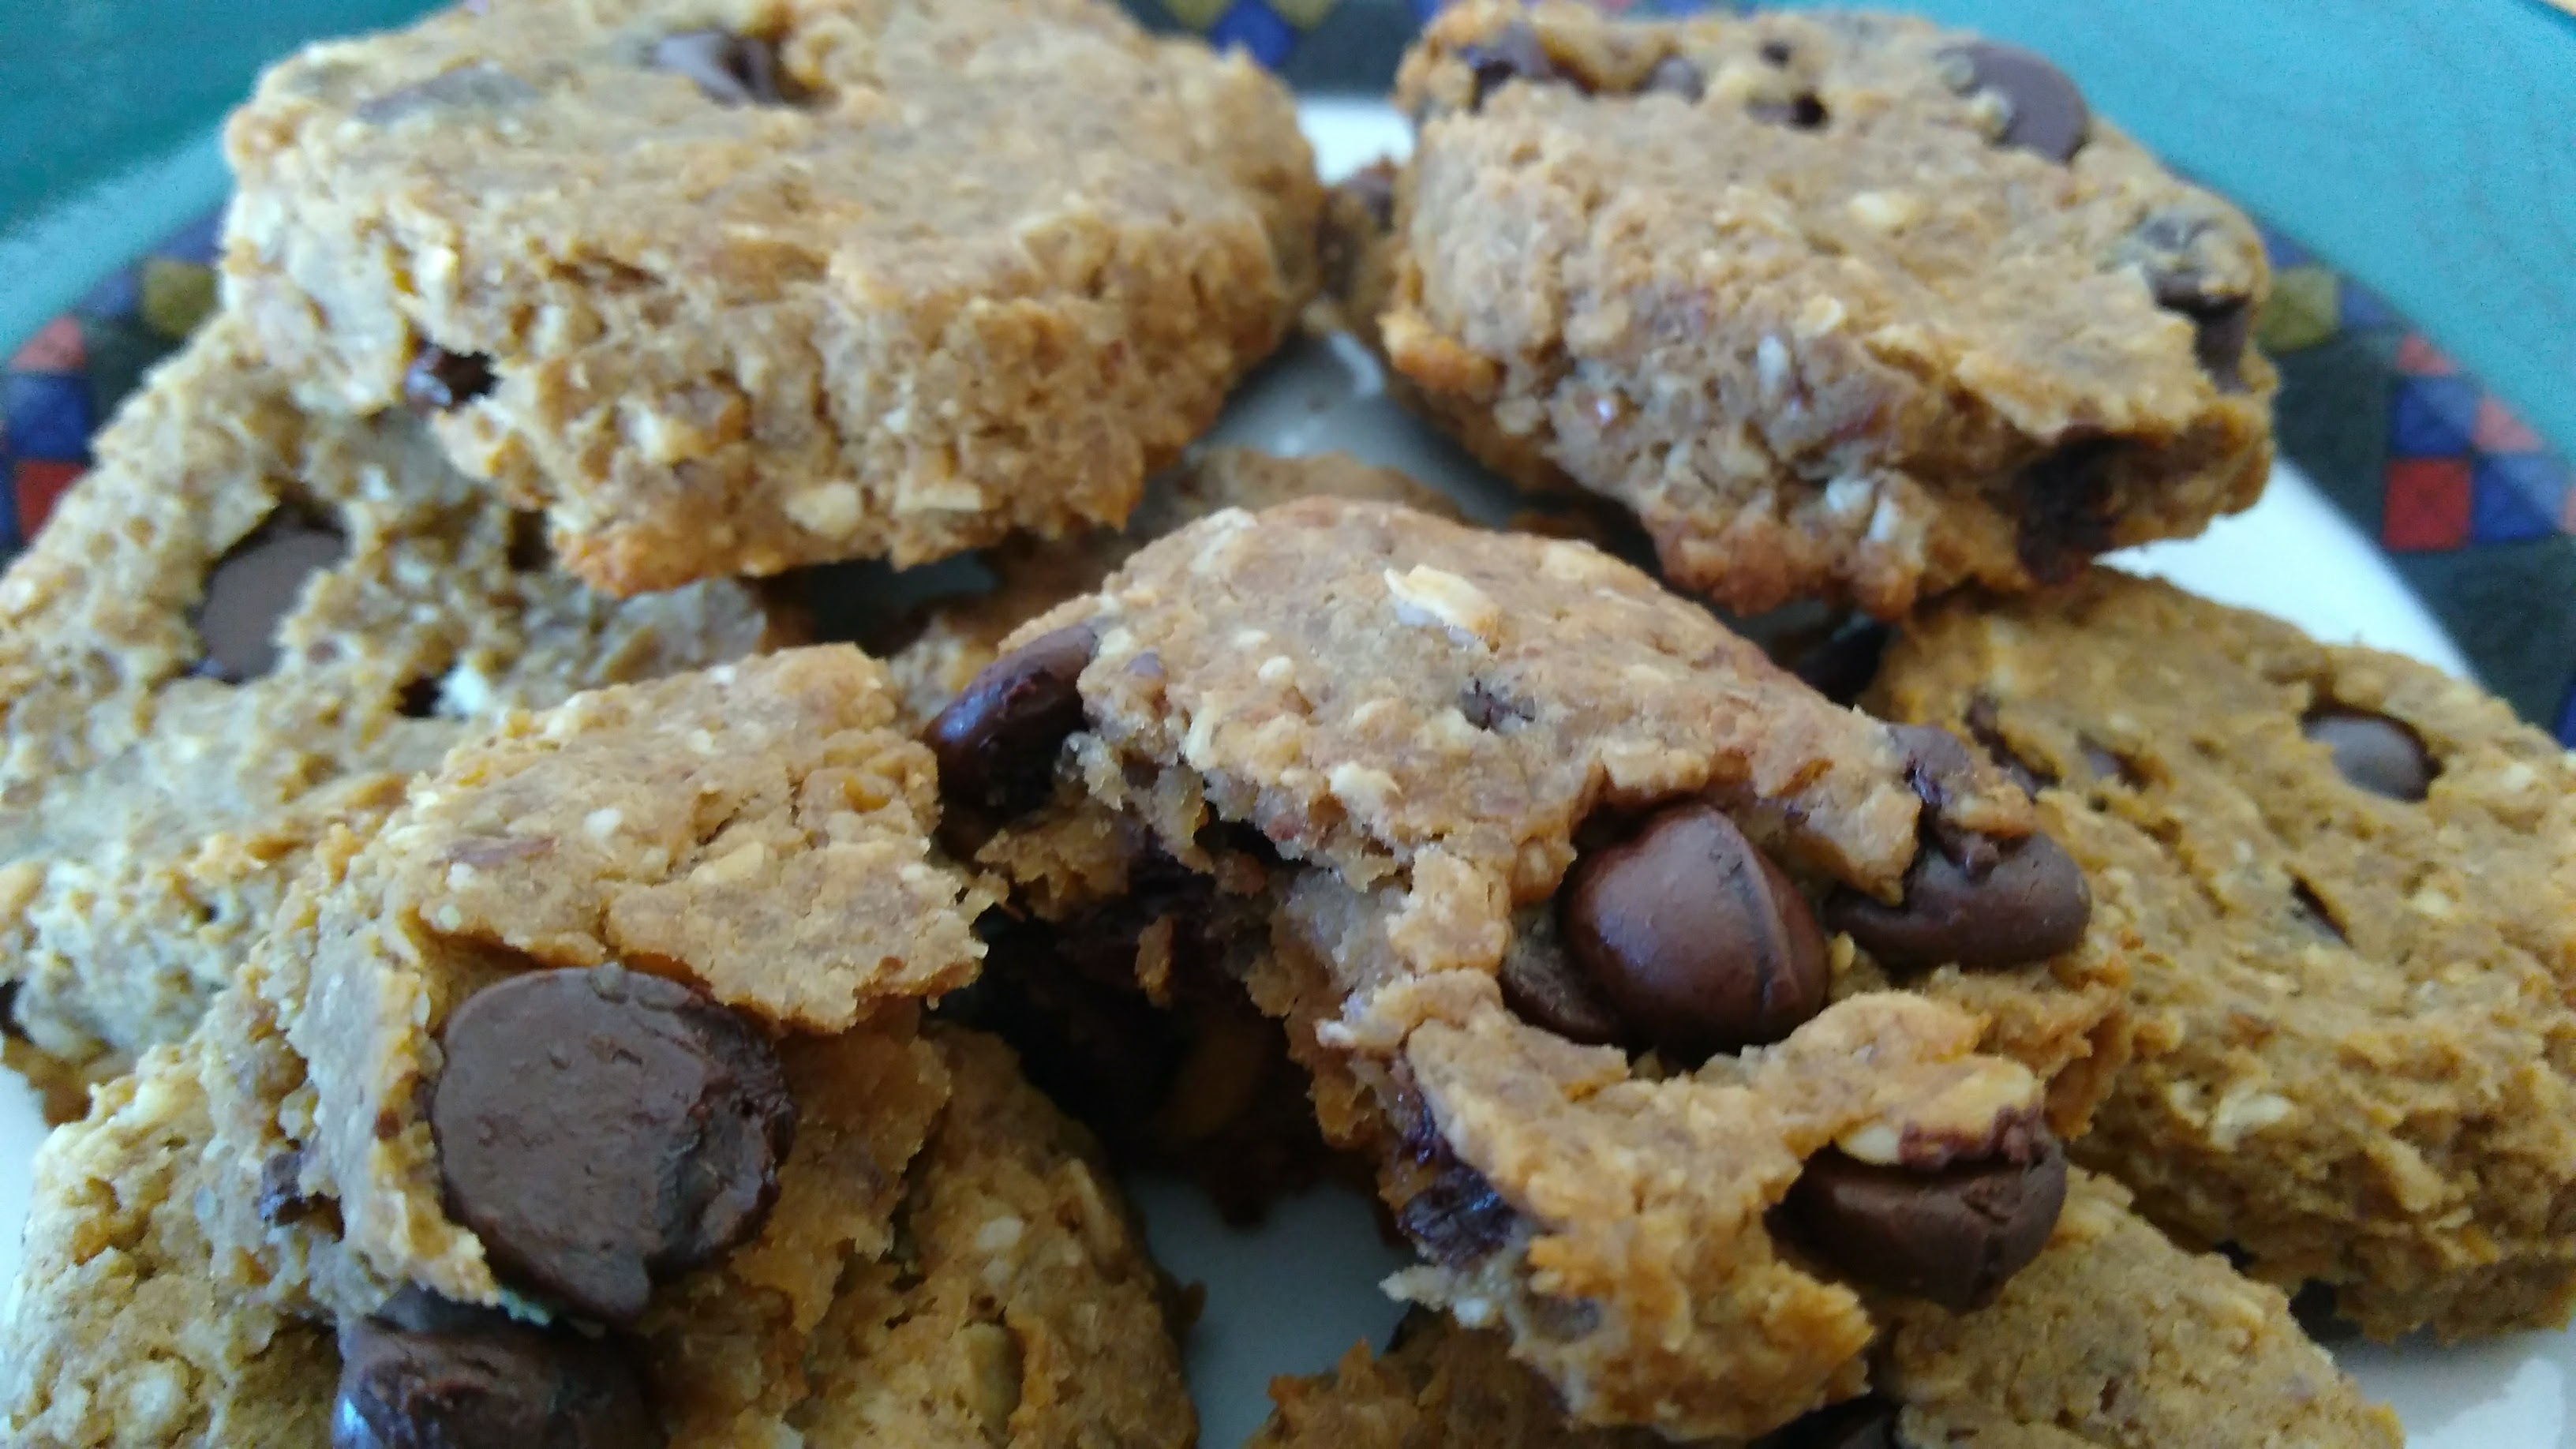 Vegan Gluten-Free Lactation Cookies